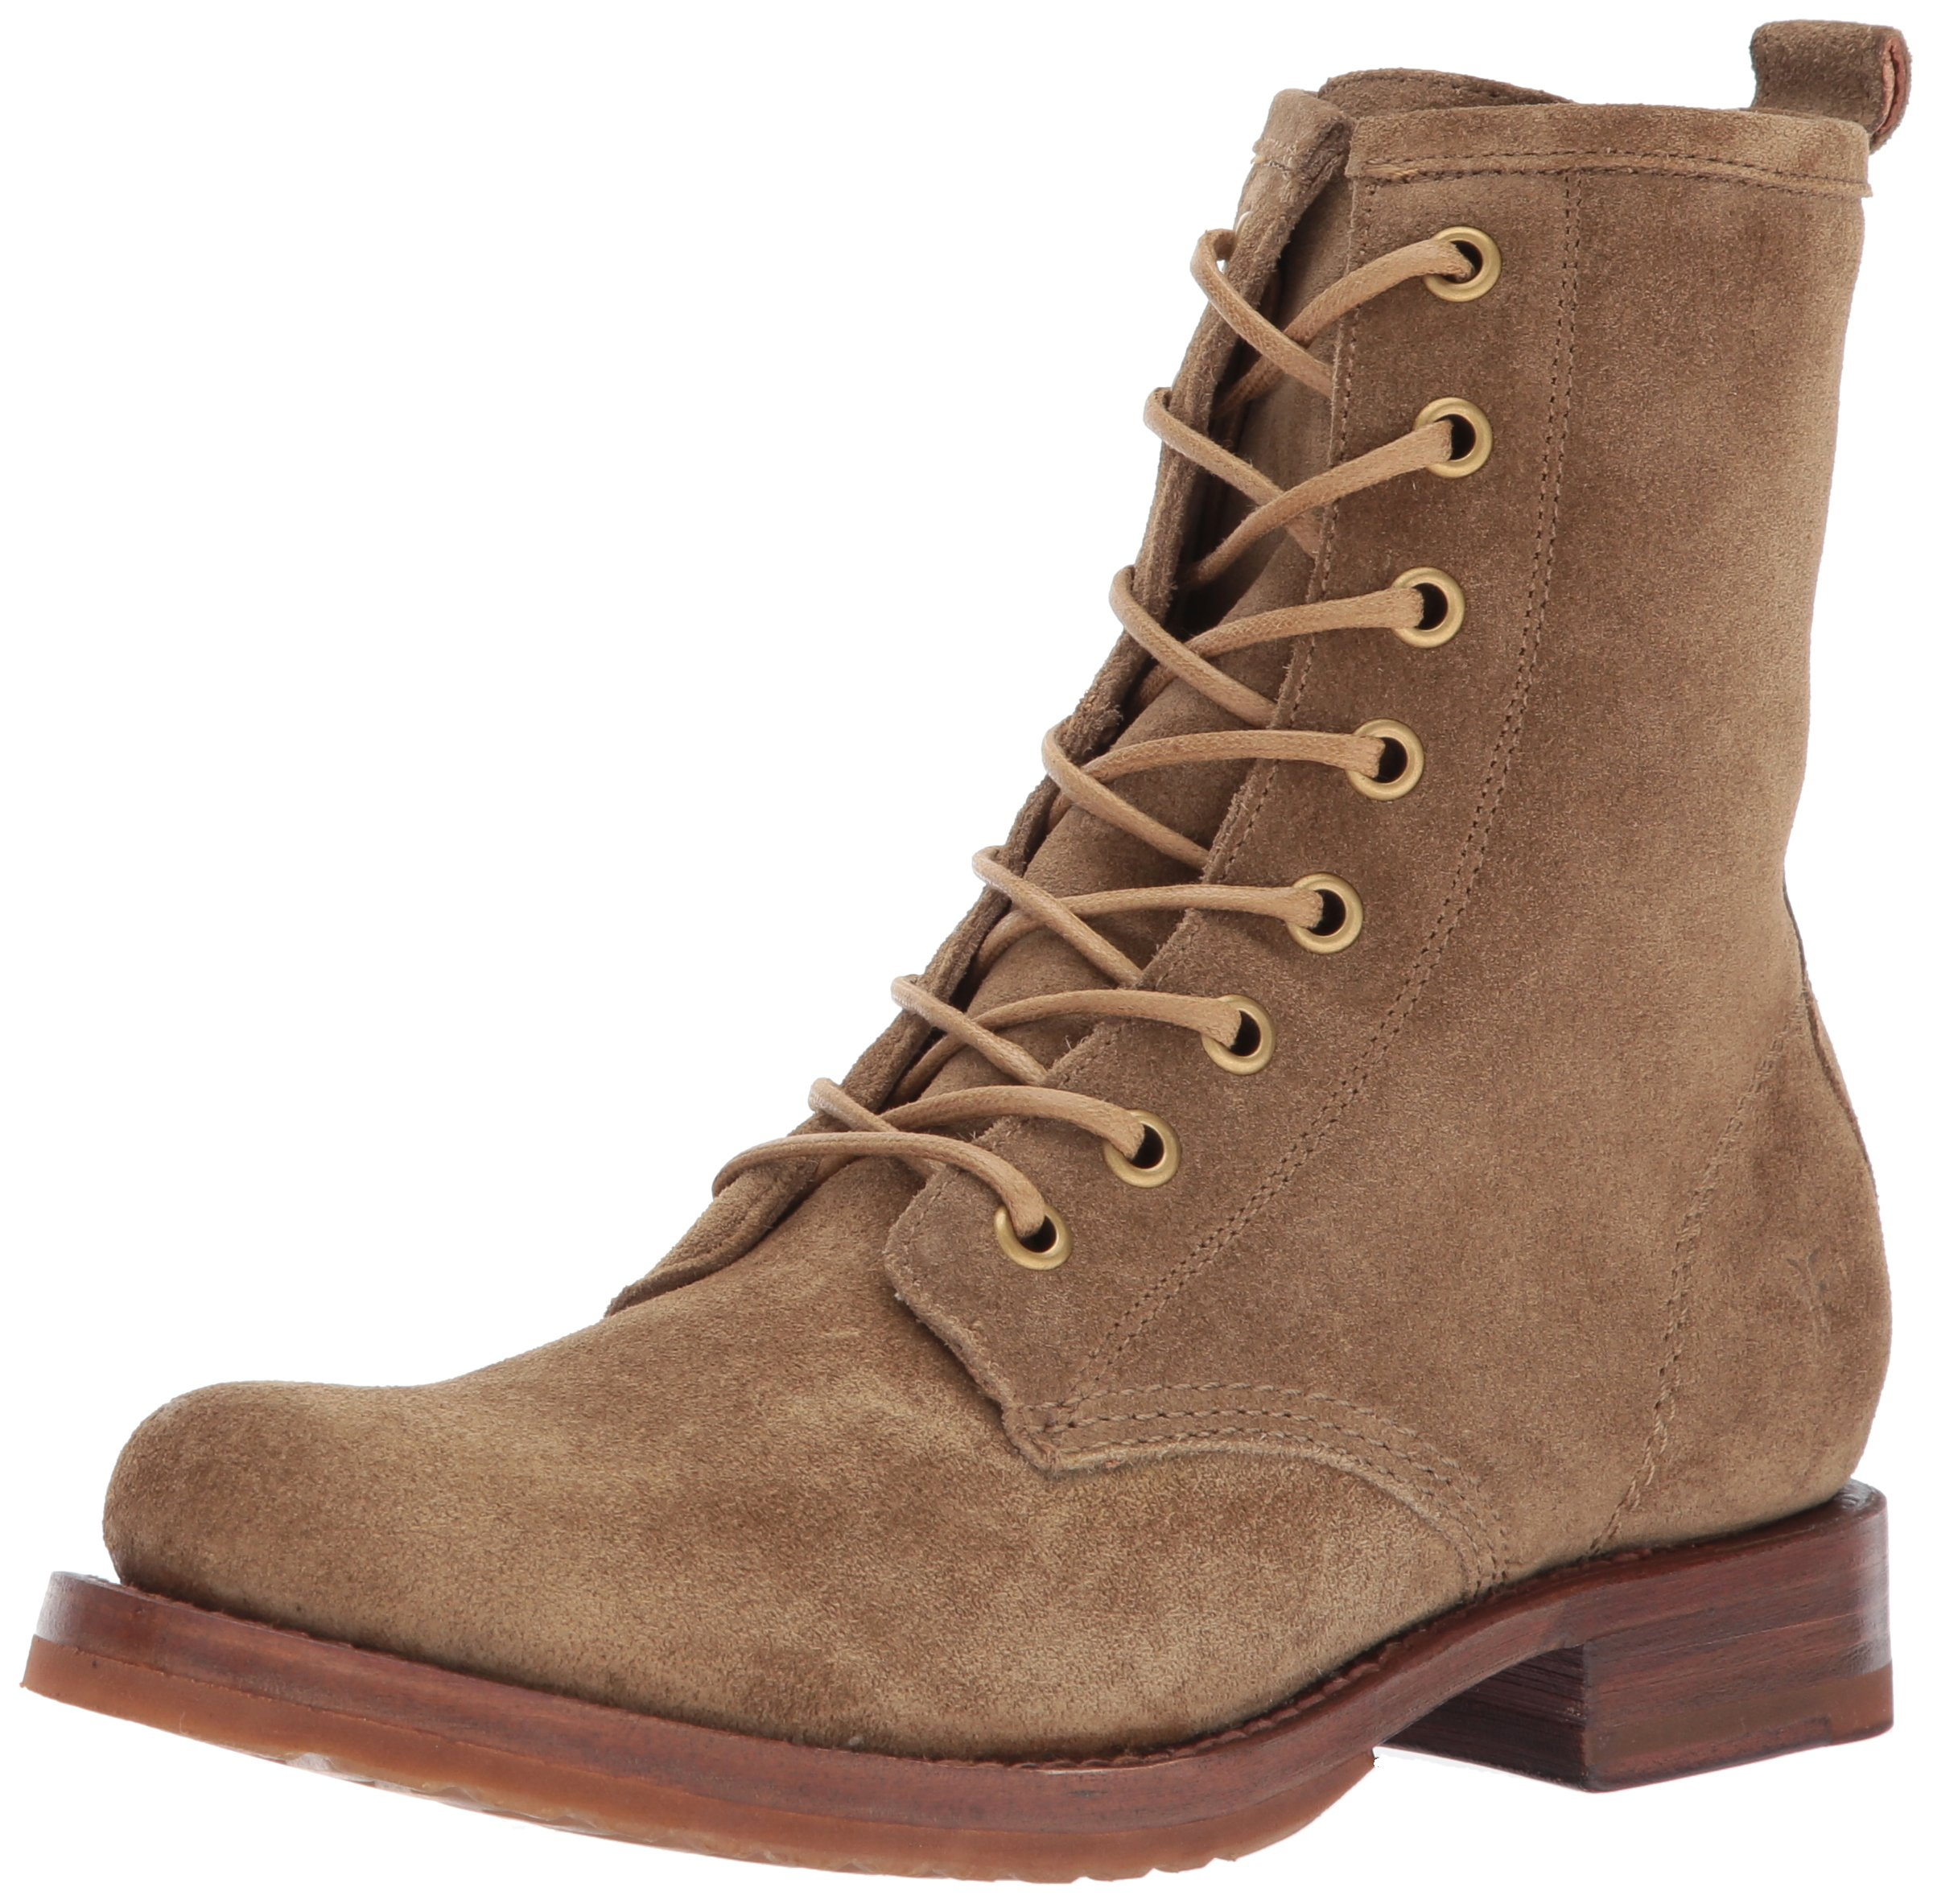 FRYE Women's Veronica Combat Boot, Cashew Soft Oiled Suede, 8 M US